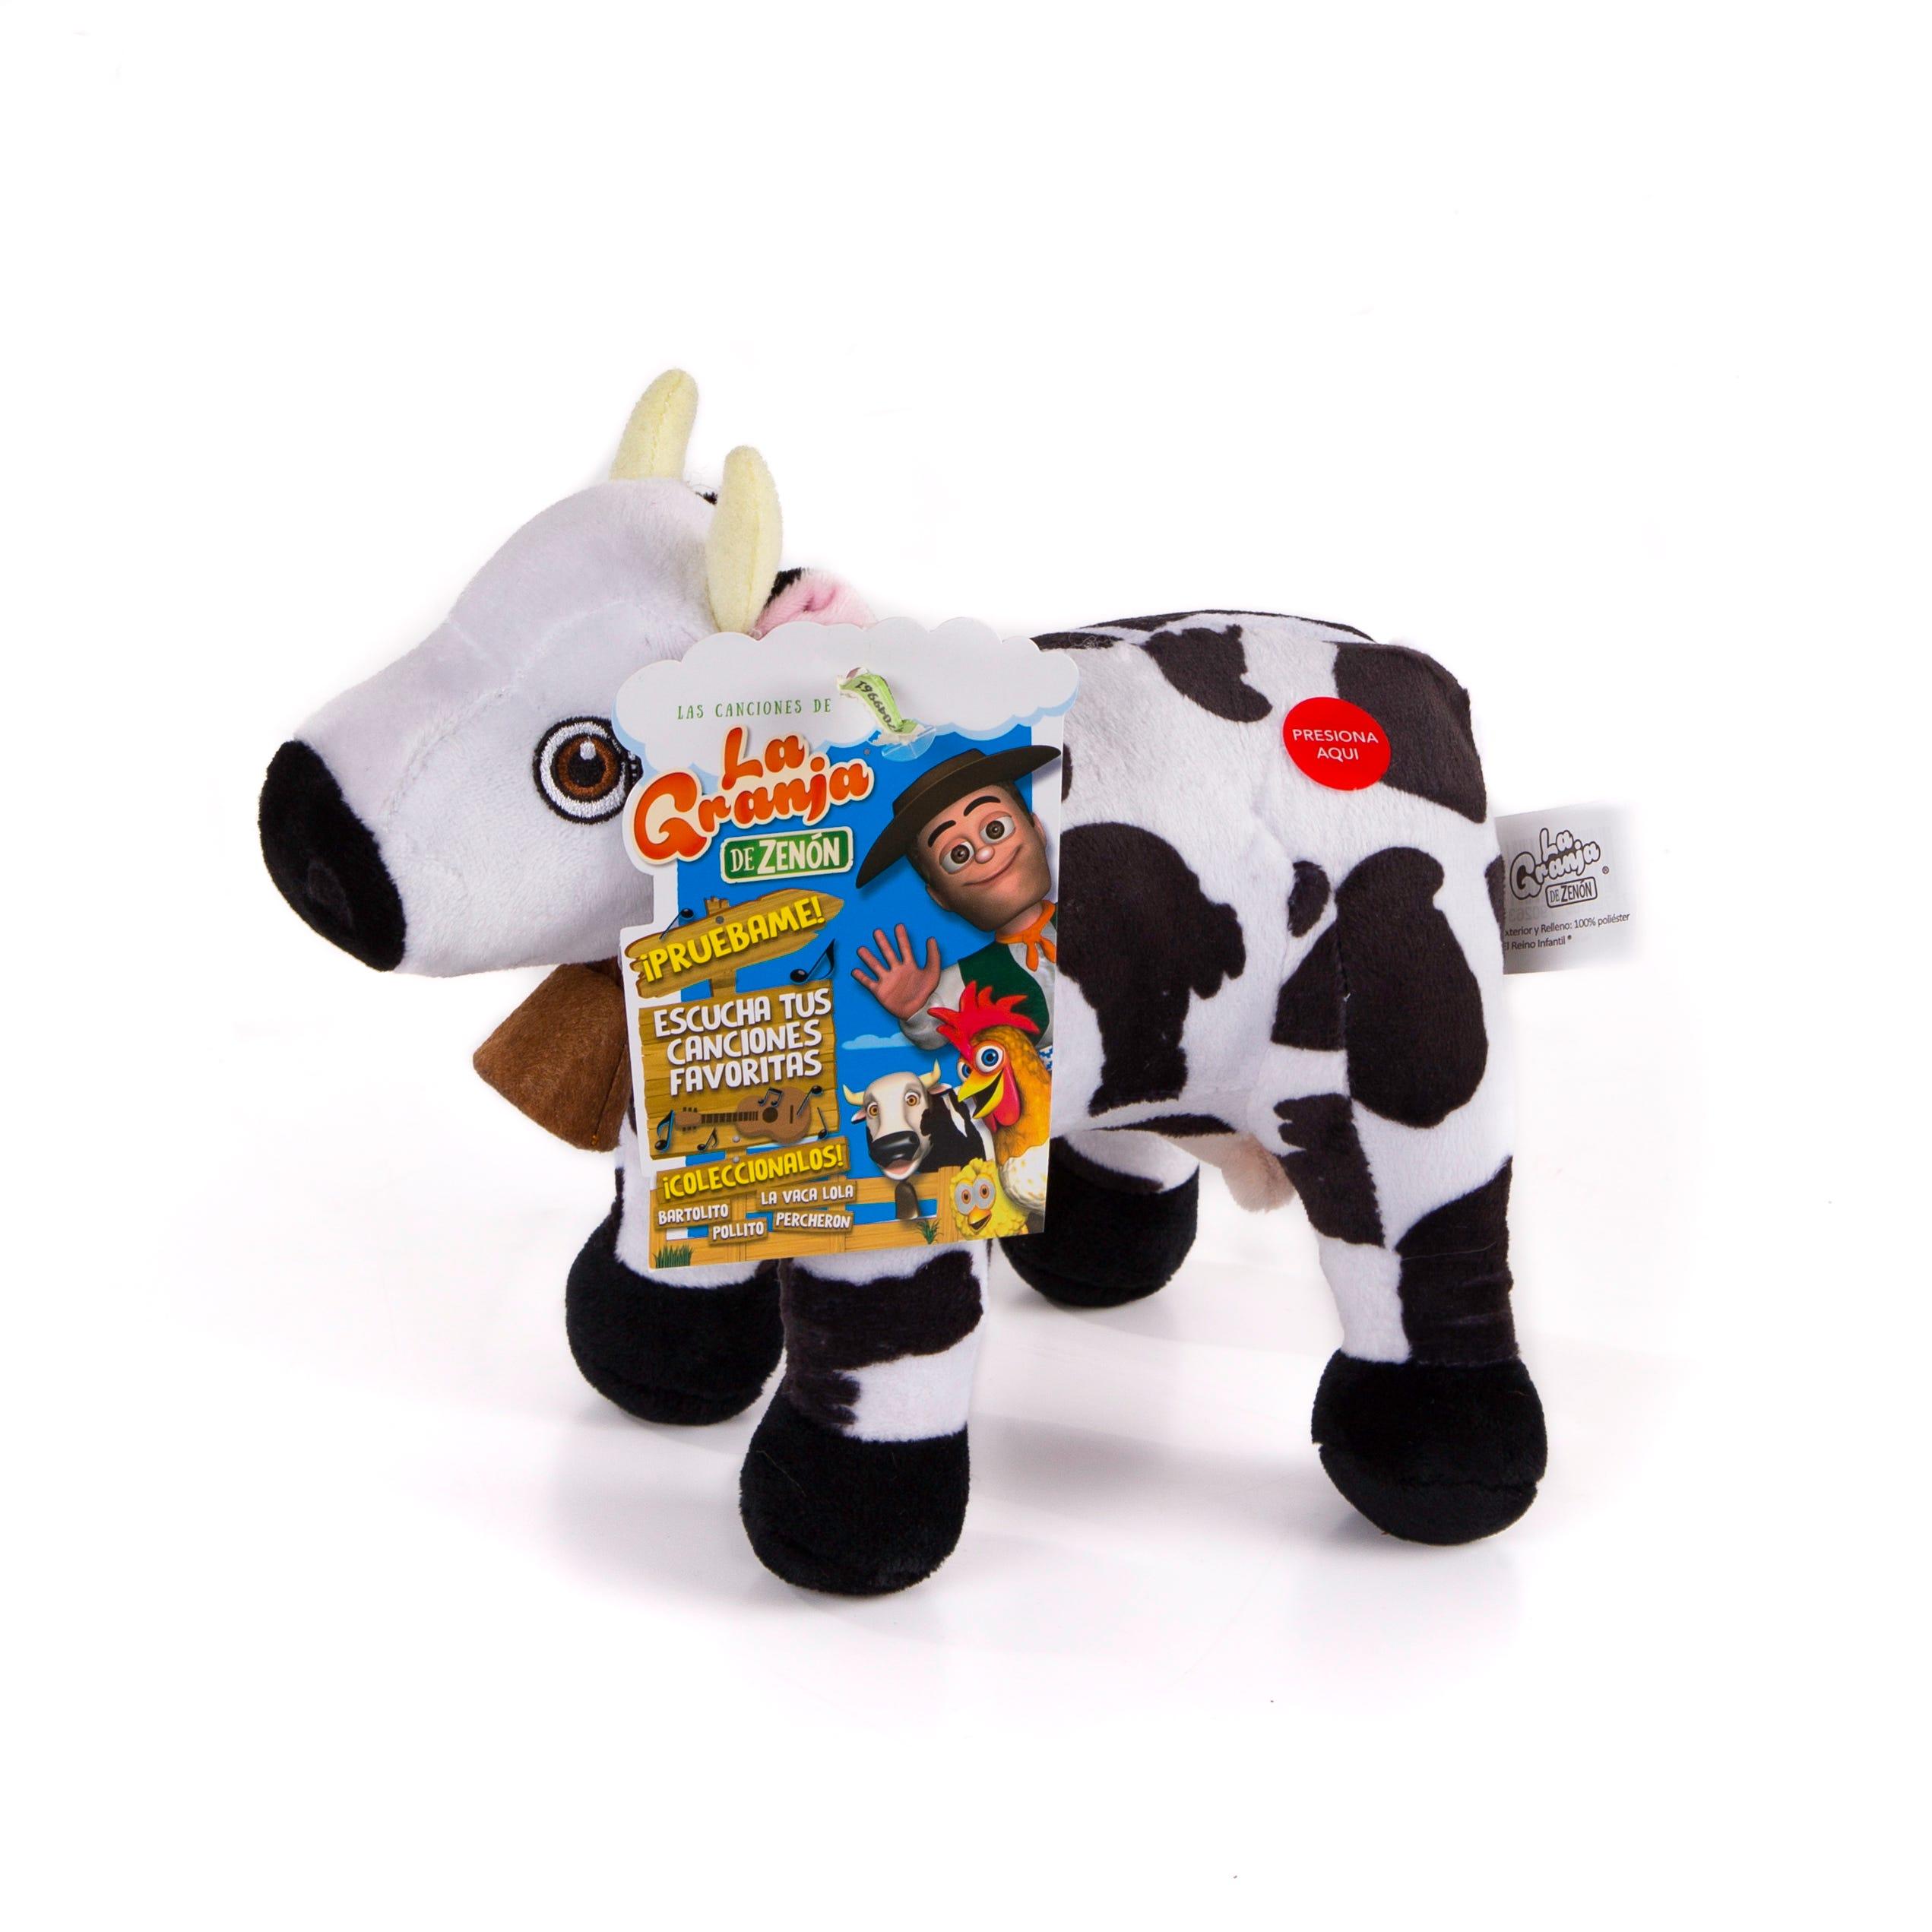 Peluche musical de La Vaca Lola La Granja de Zenón